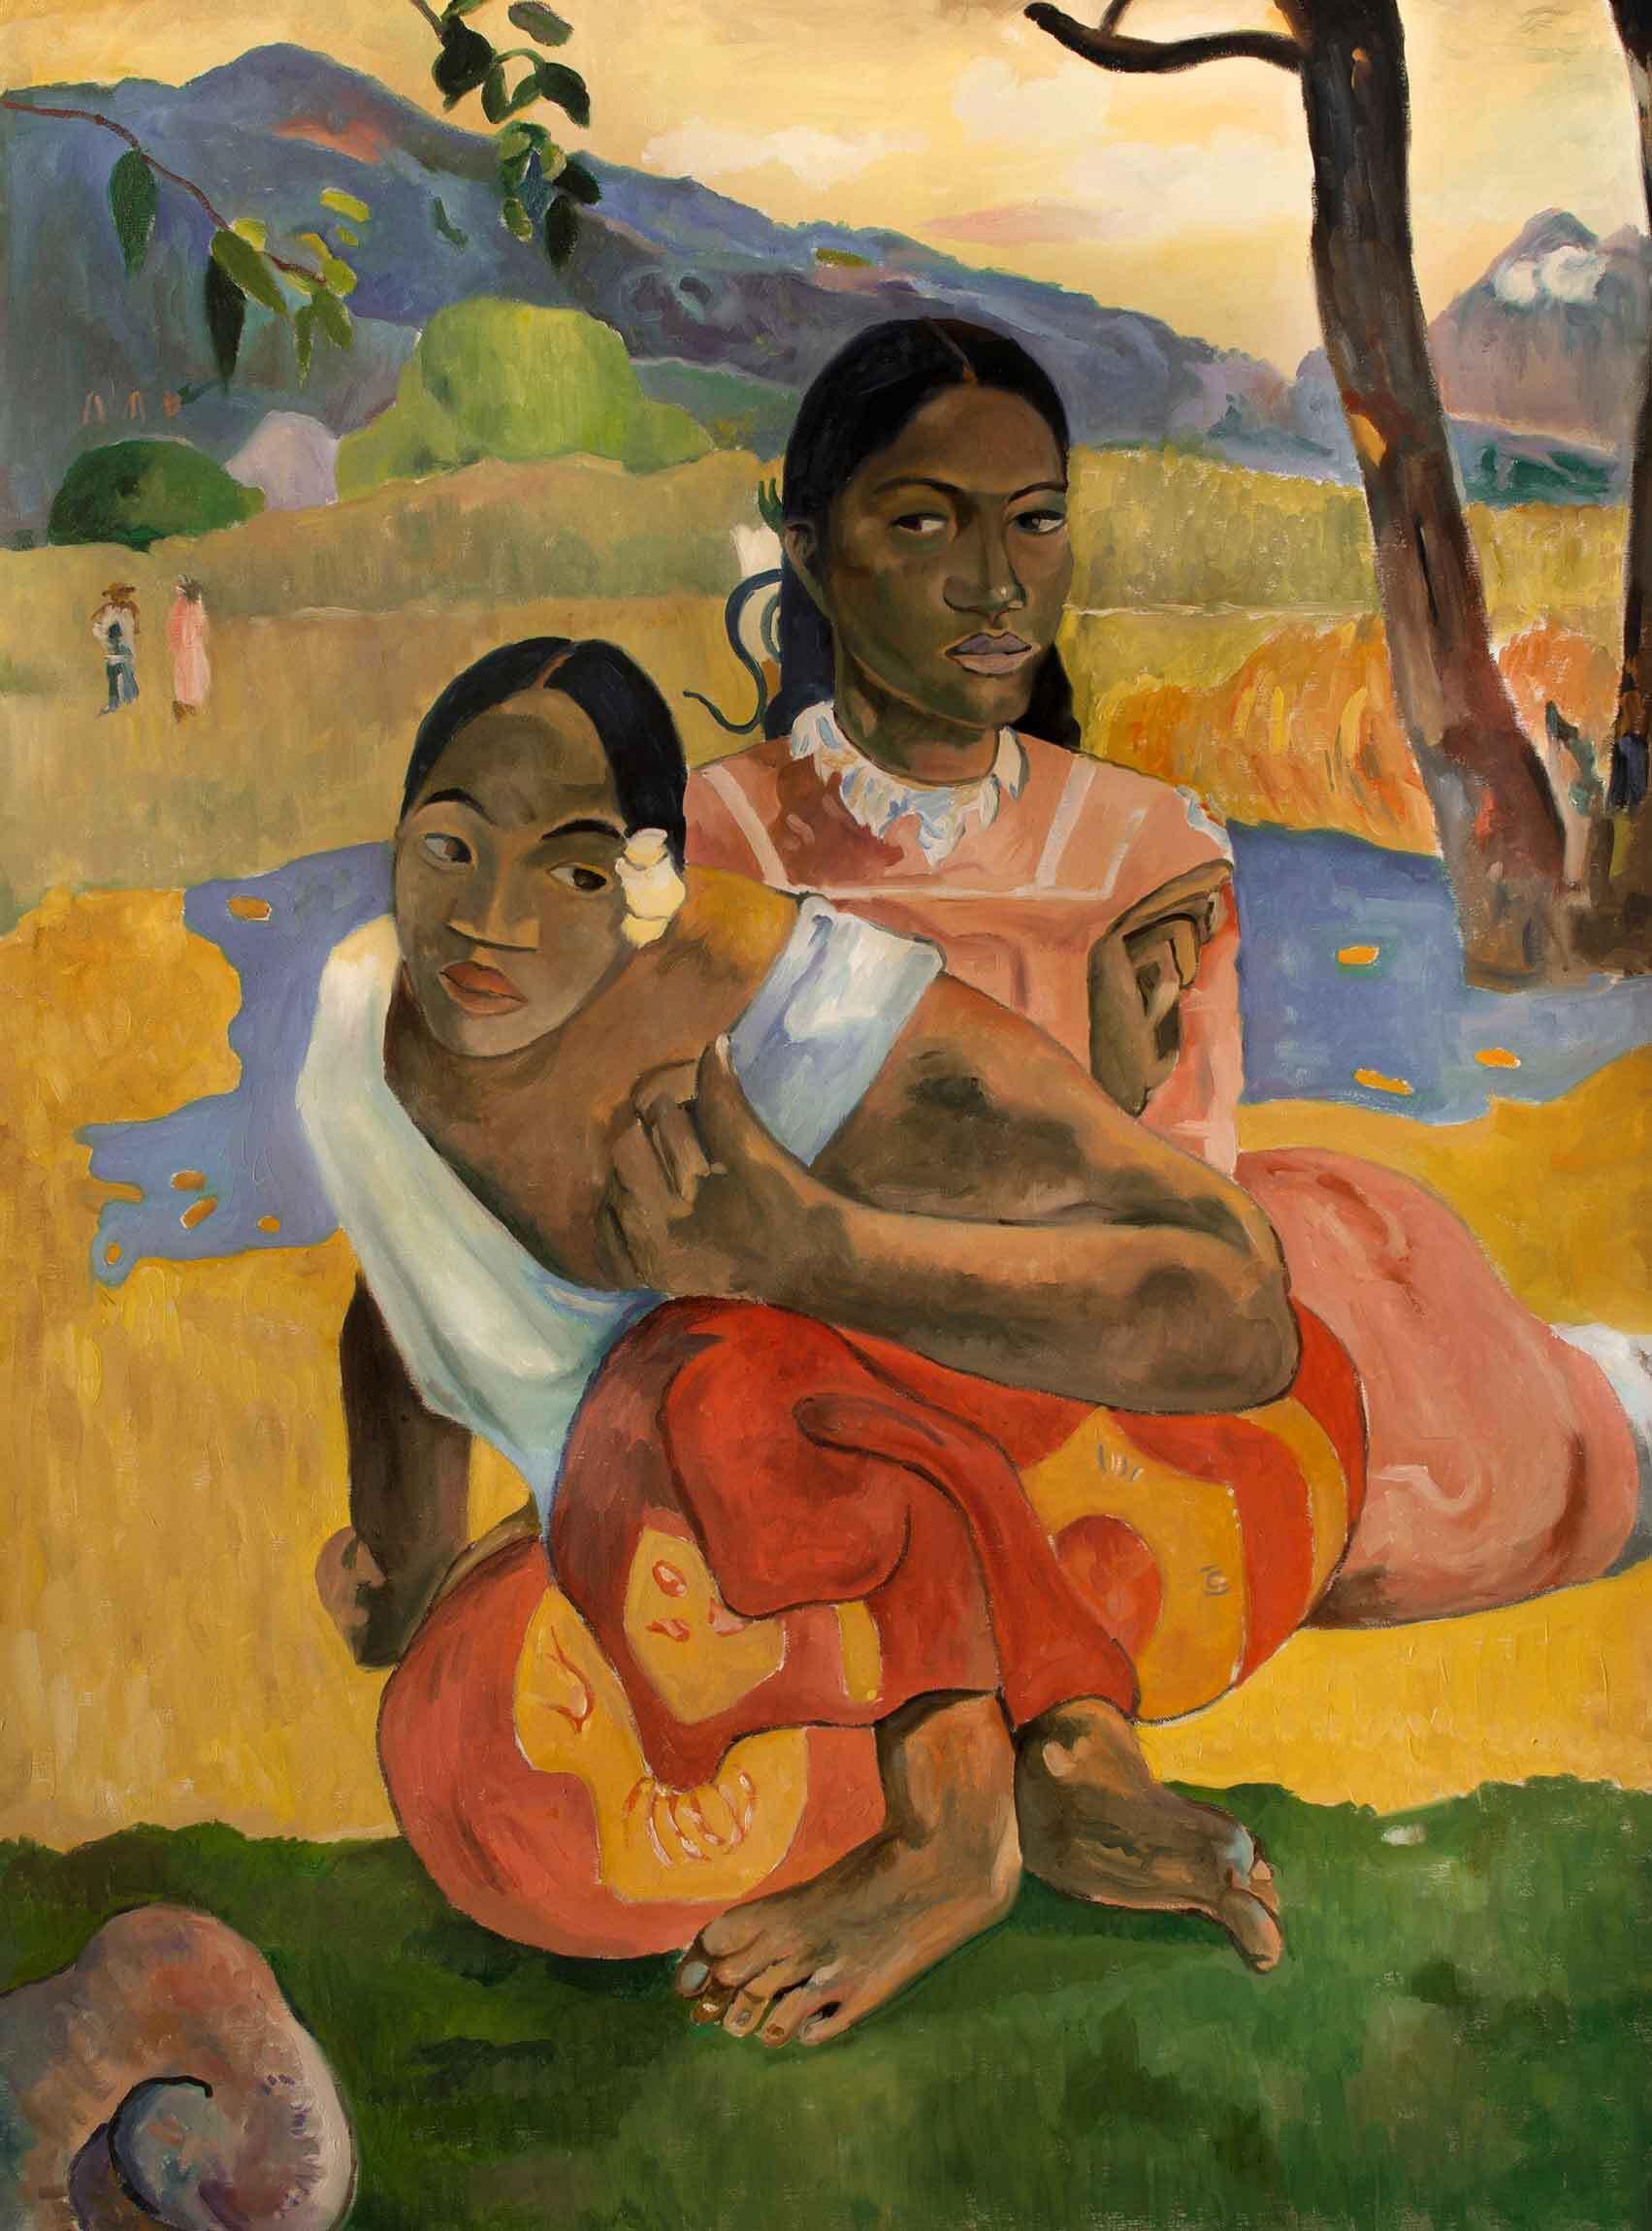 Reproducción de un cuadro de Gauguin, ¿Cuándo te casas?